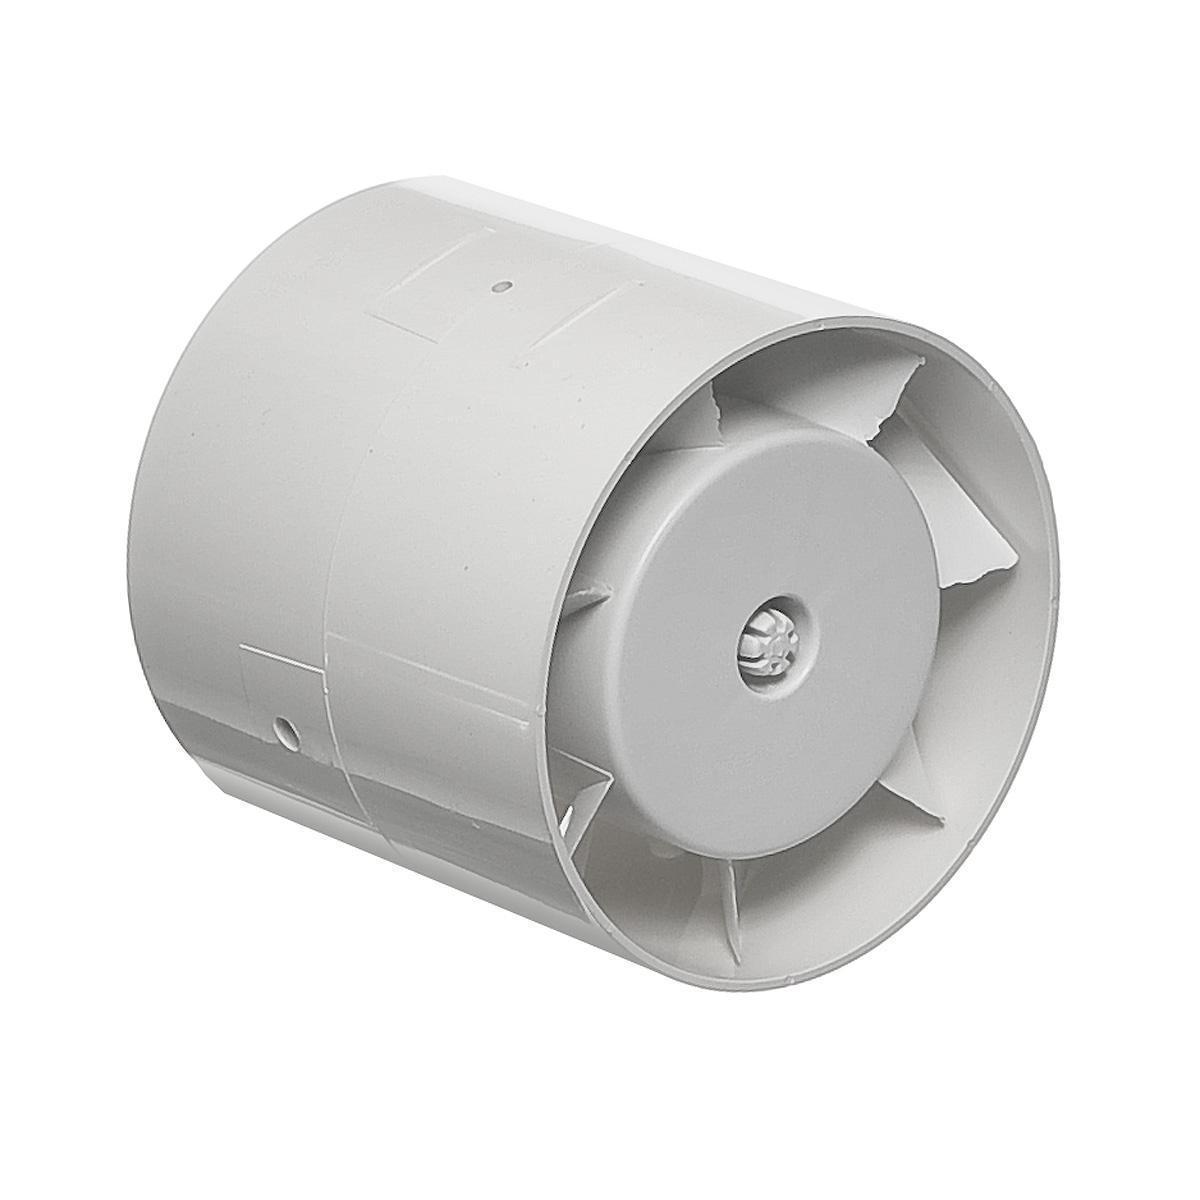 Cata Канальный вентилятор Cata MT-100 0edb0-5a07-11e1-bfea-00259036a114_2000x0_1.JPG